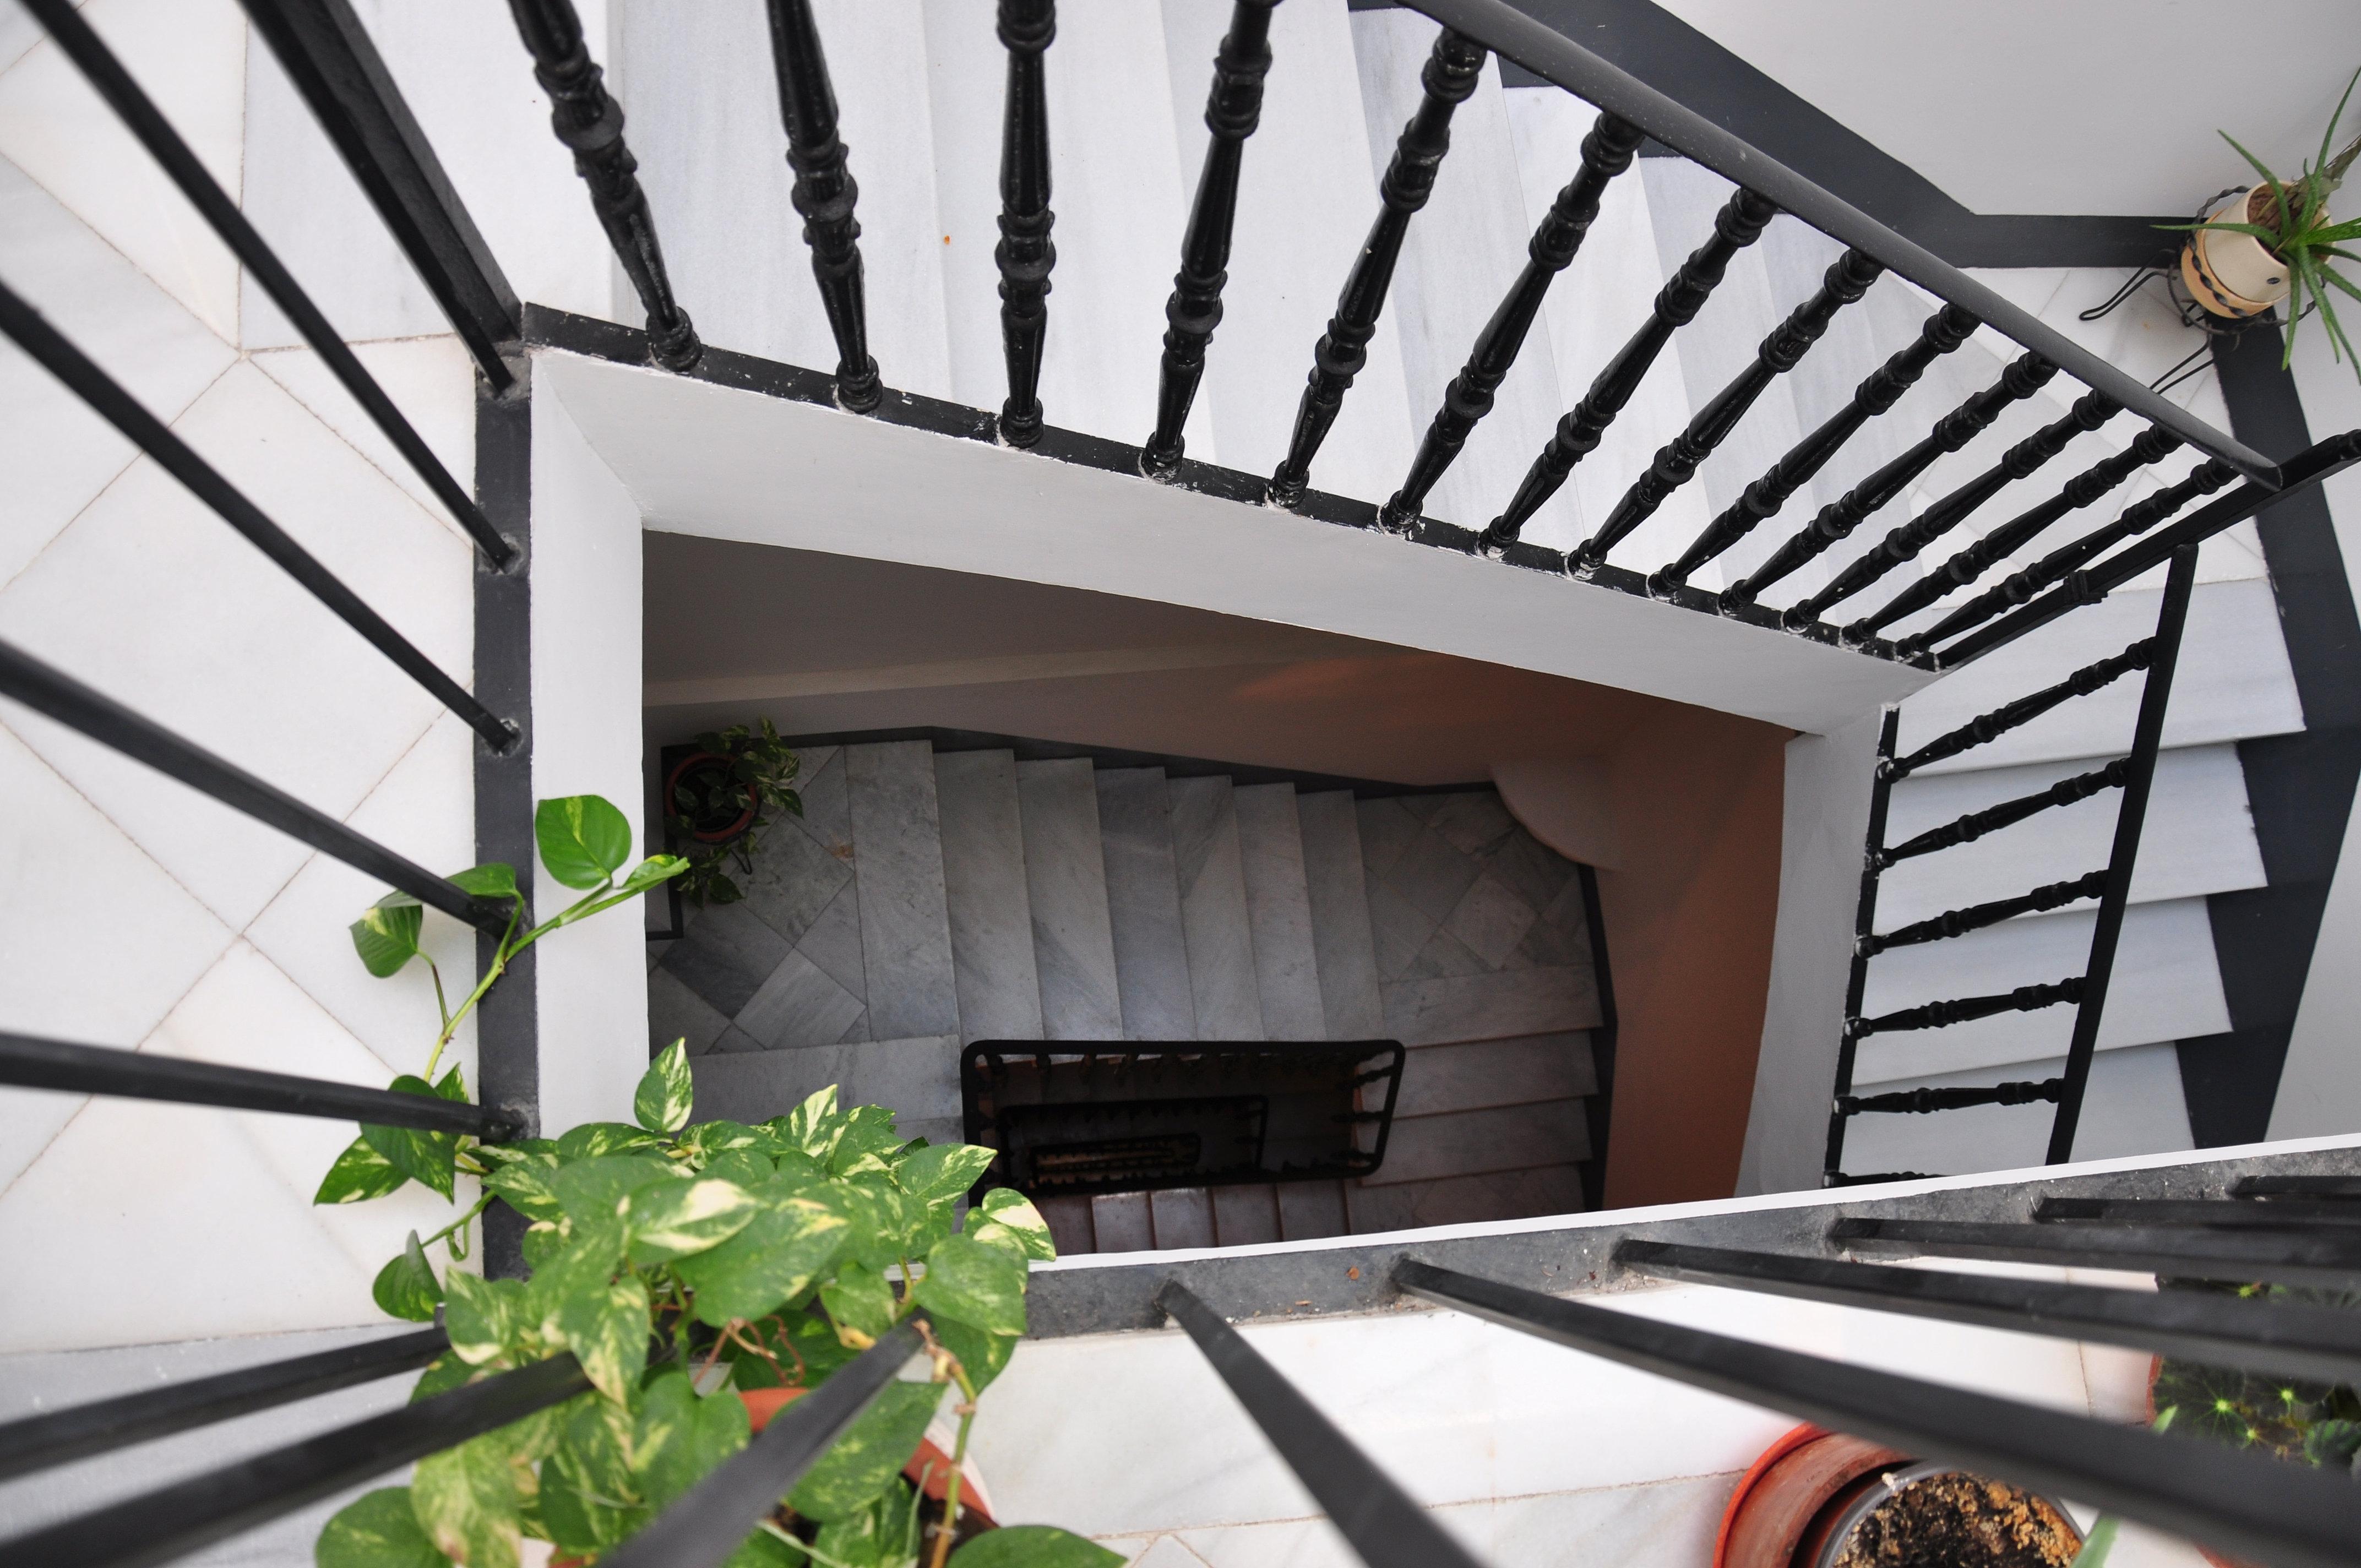 Luengo arquitectos lu s vives - Luengo arquitectos valencia ...